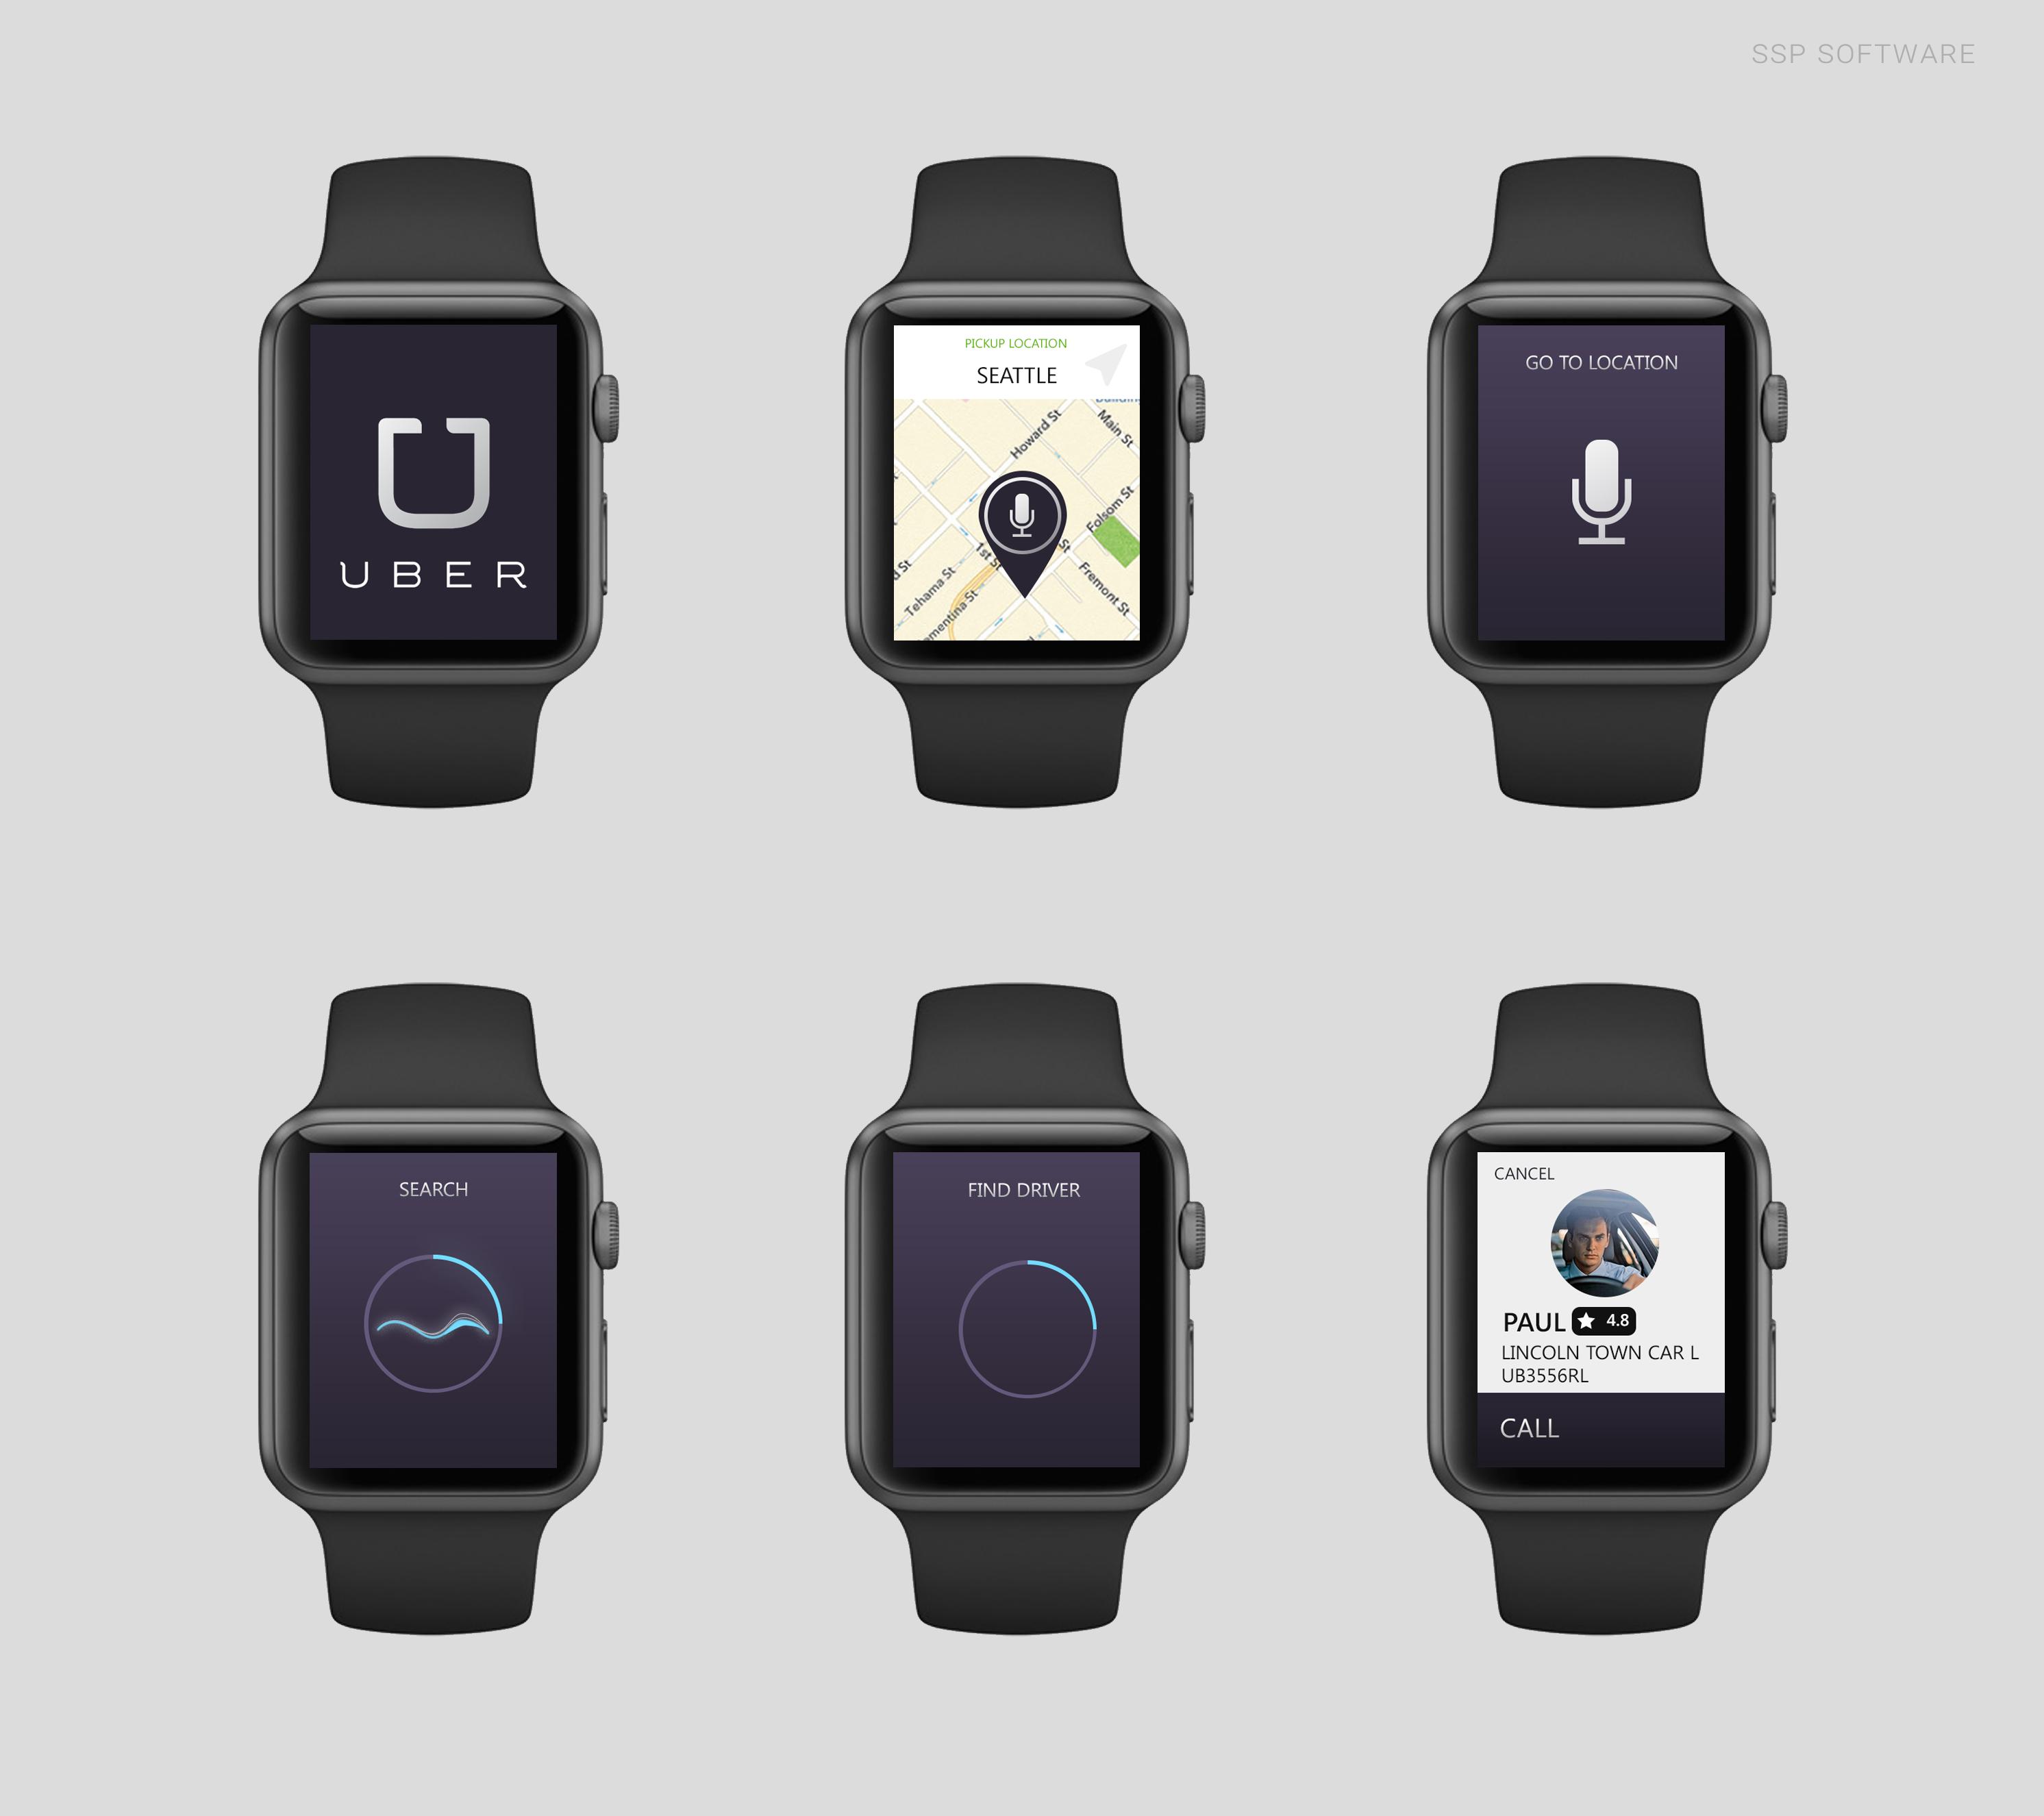 Apple watch ios 4 apps